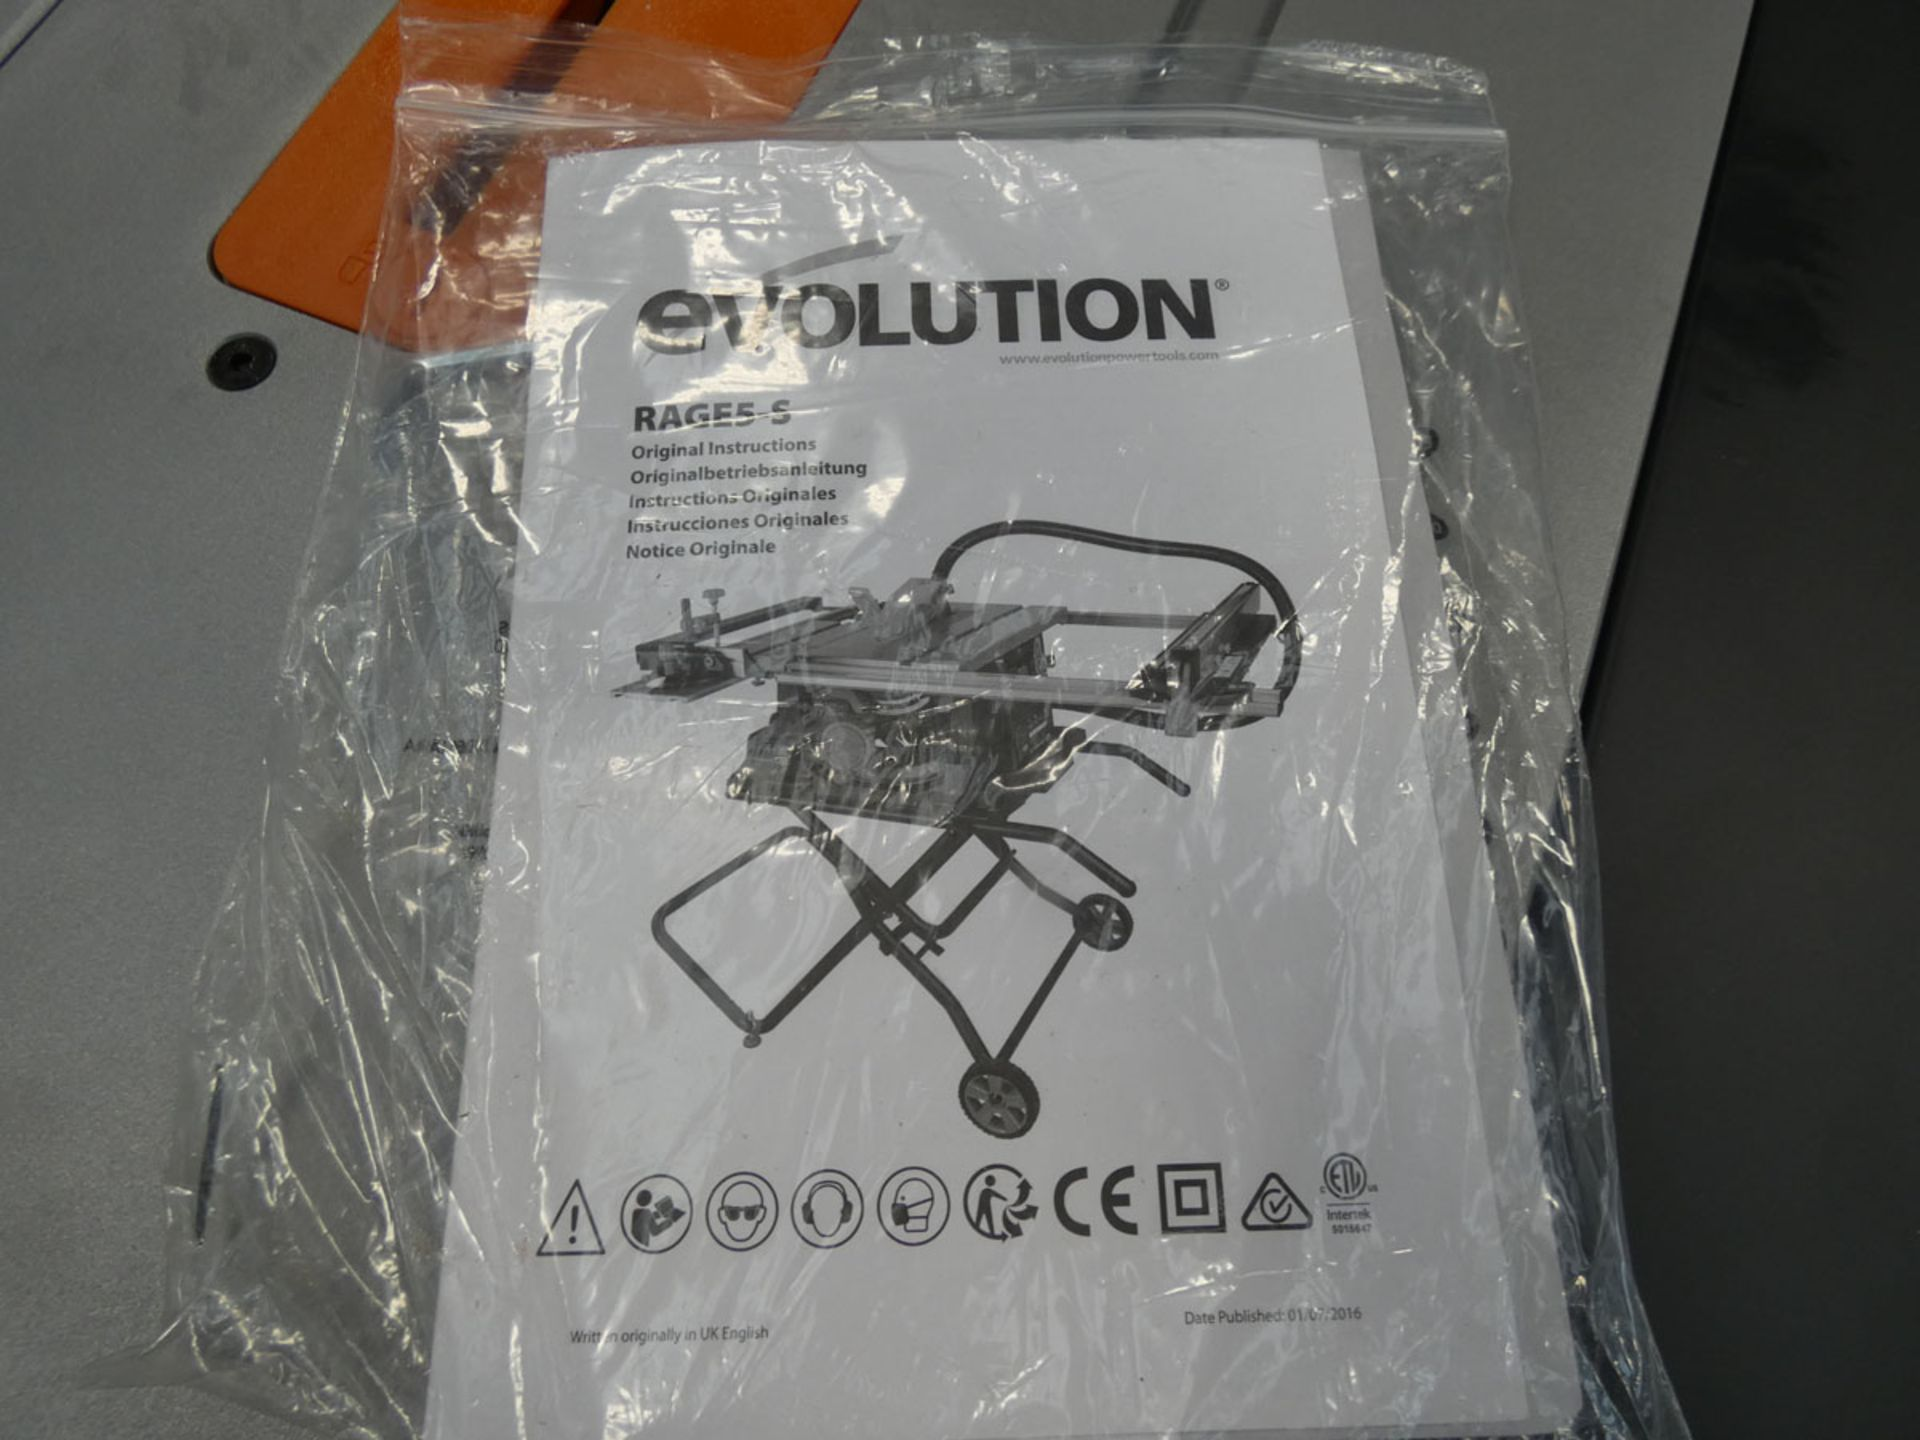 Evolution Rage 5-S table saw - Image 2 of 6